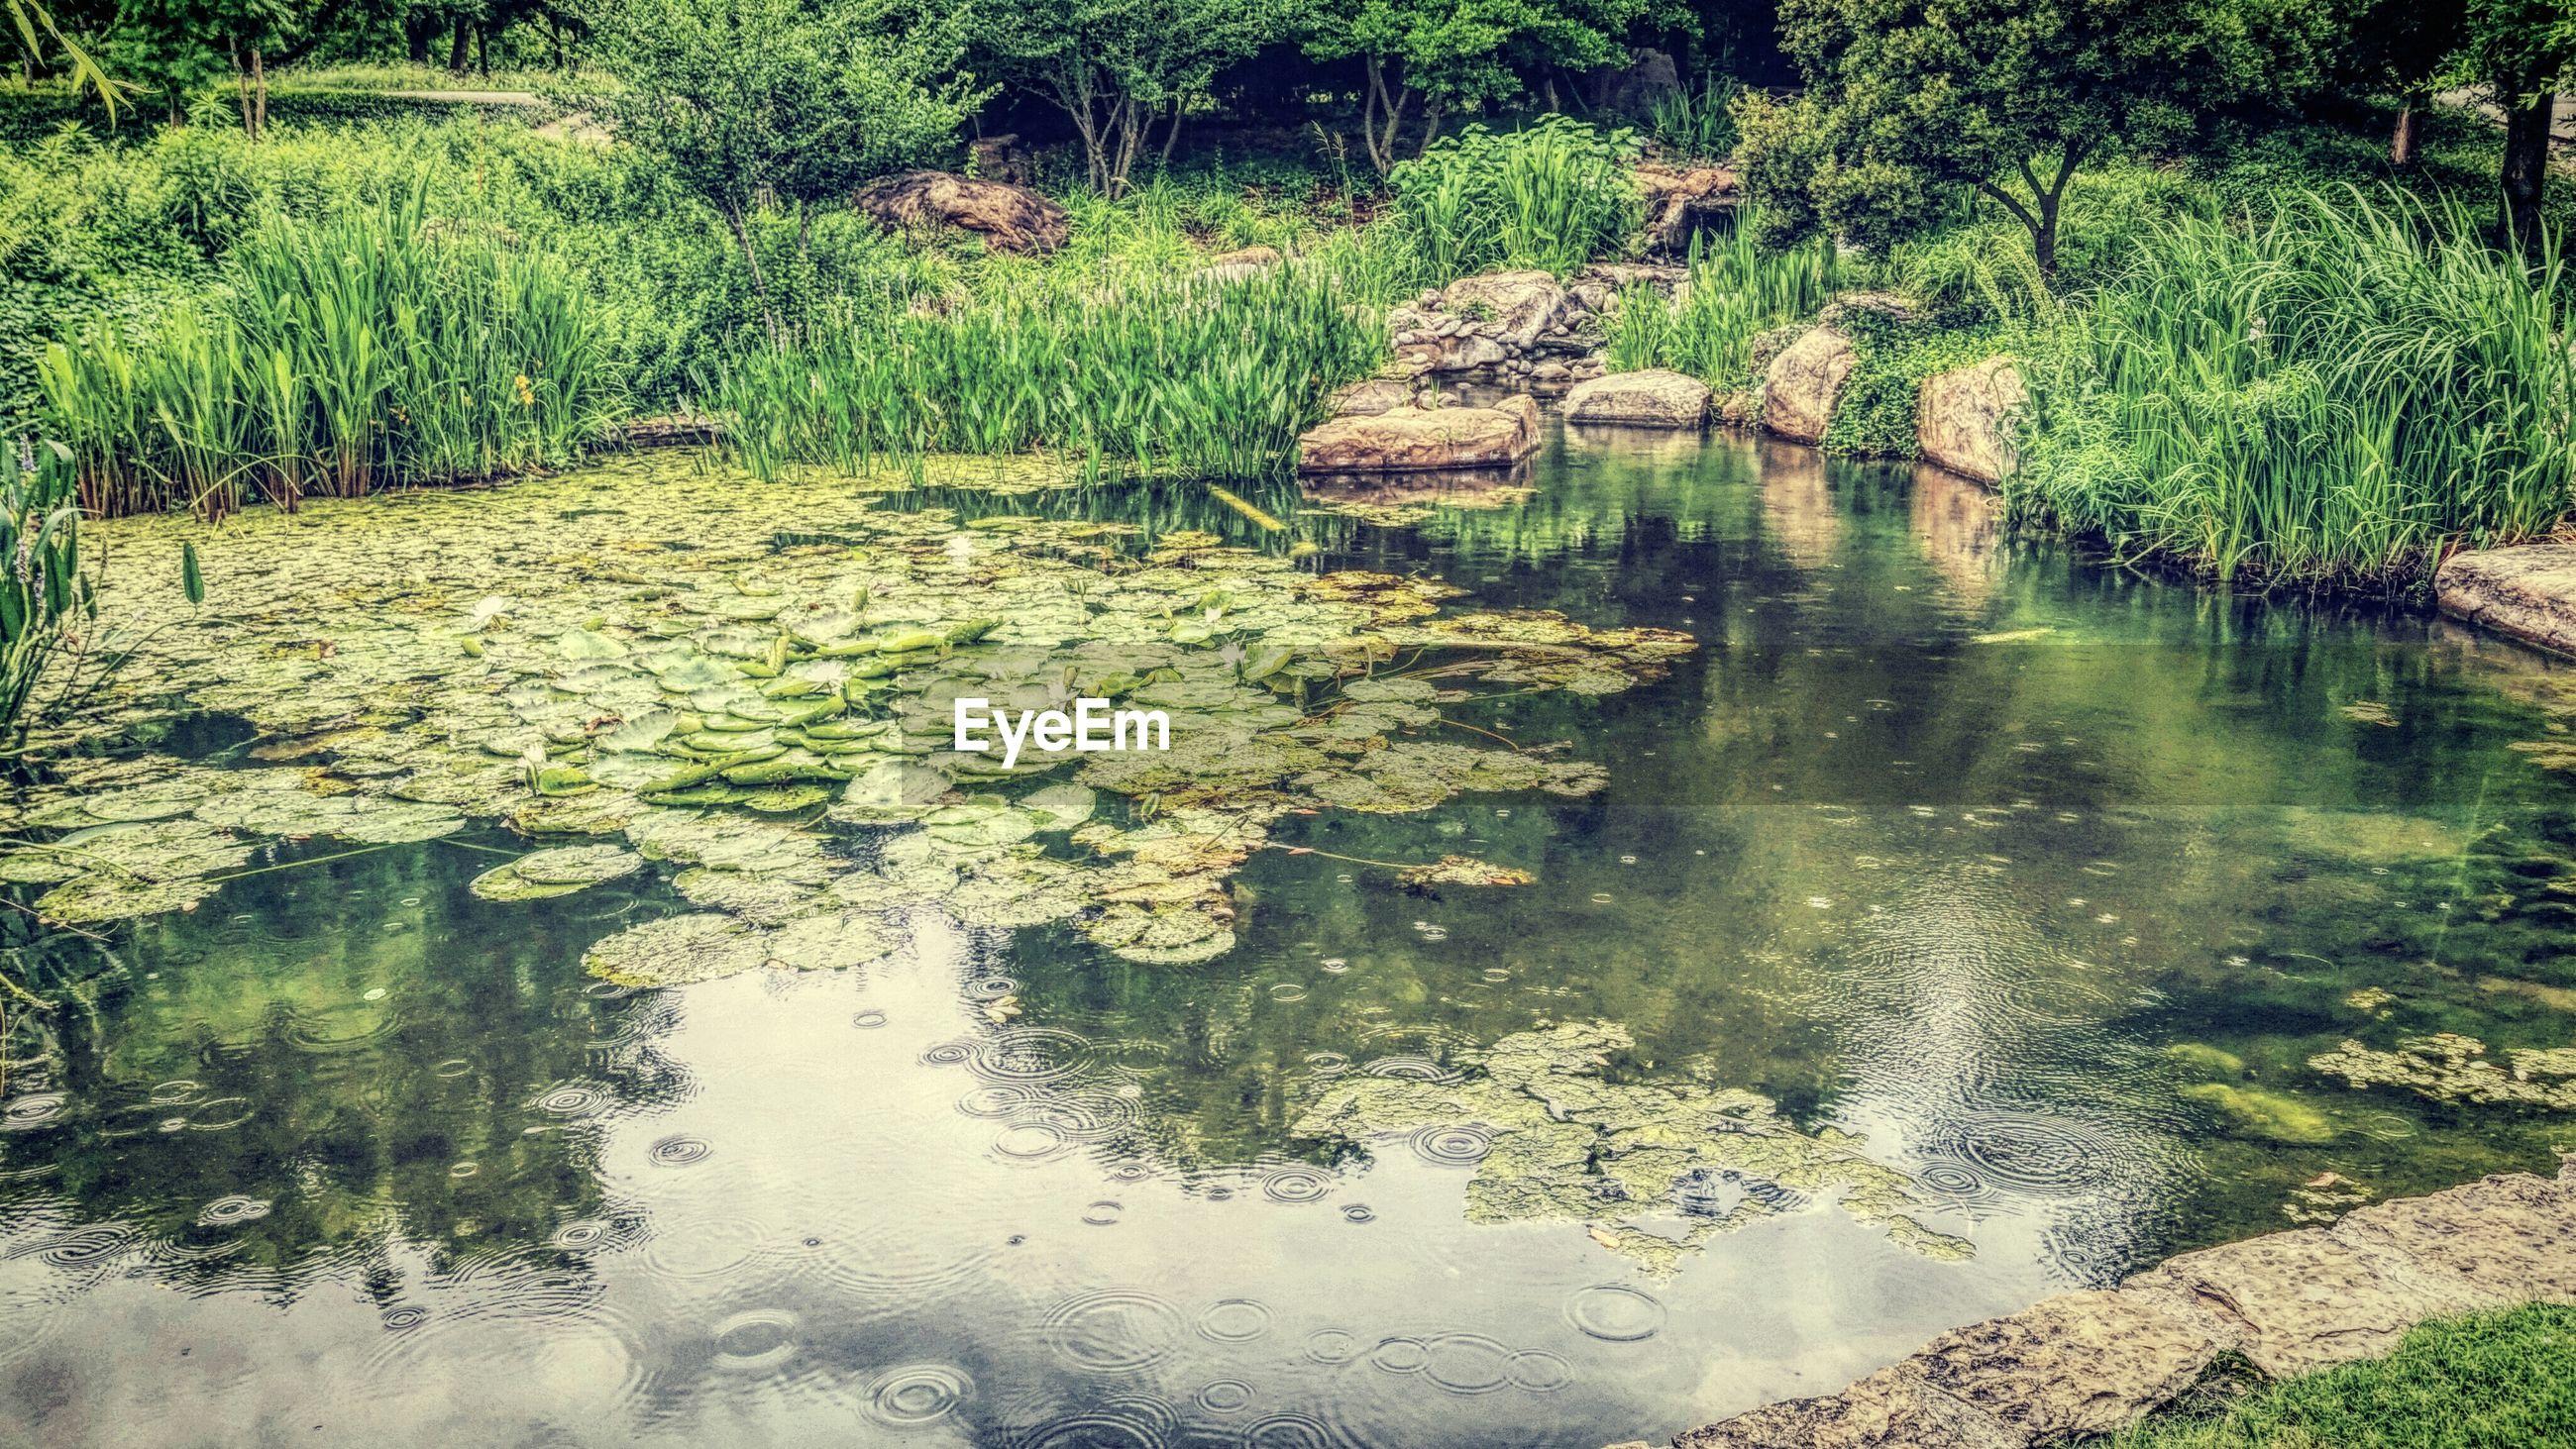 View of lotus leaves floating on water